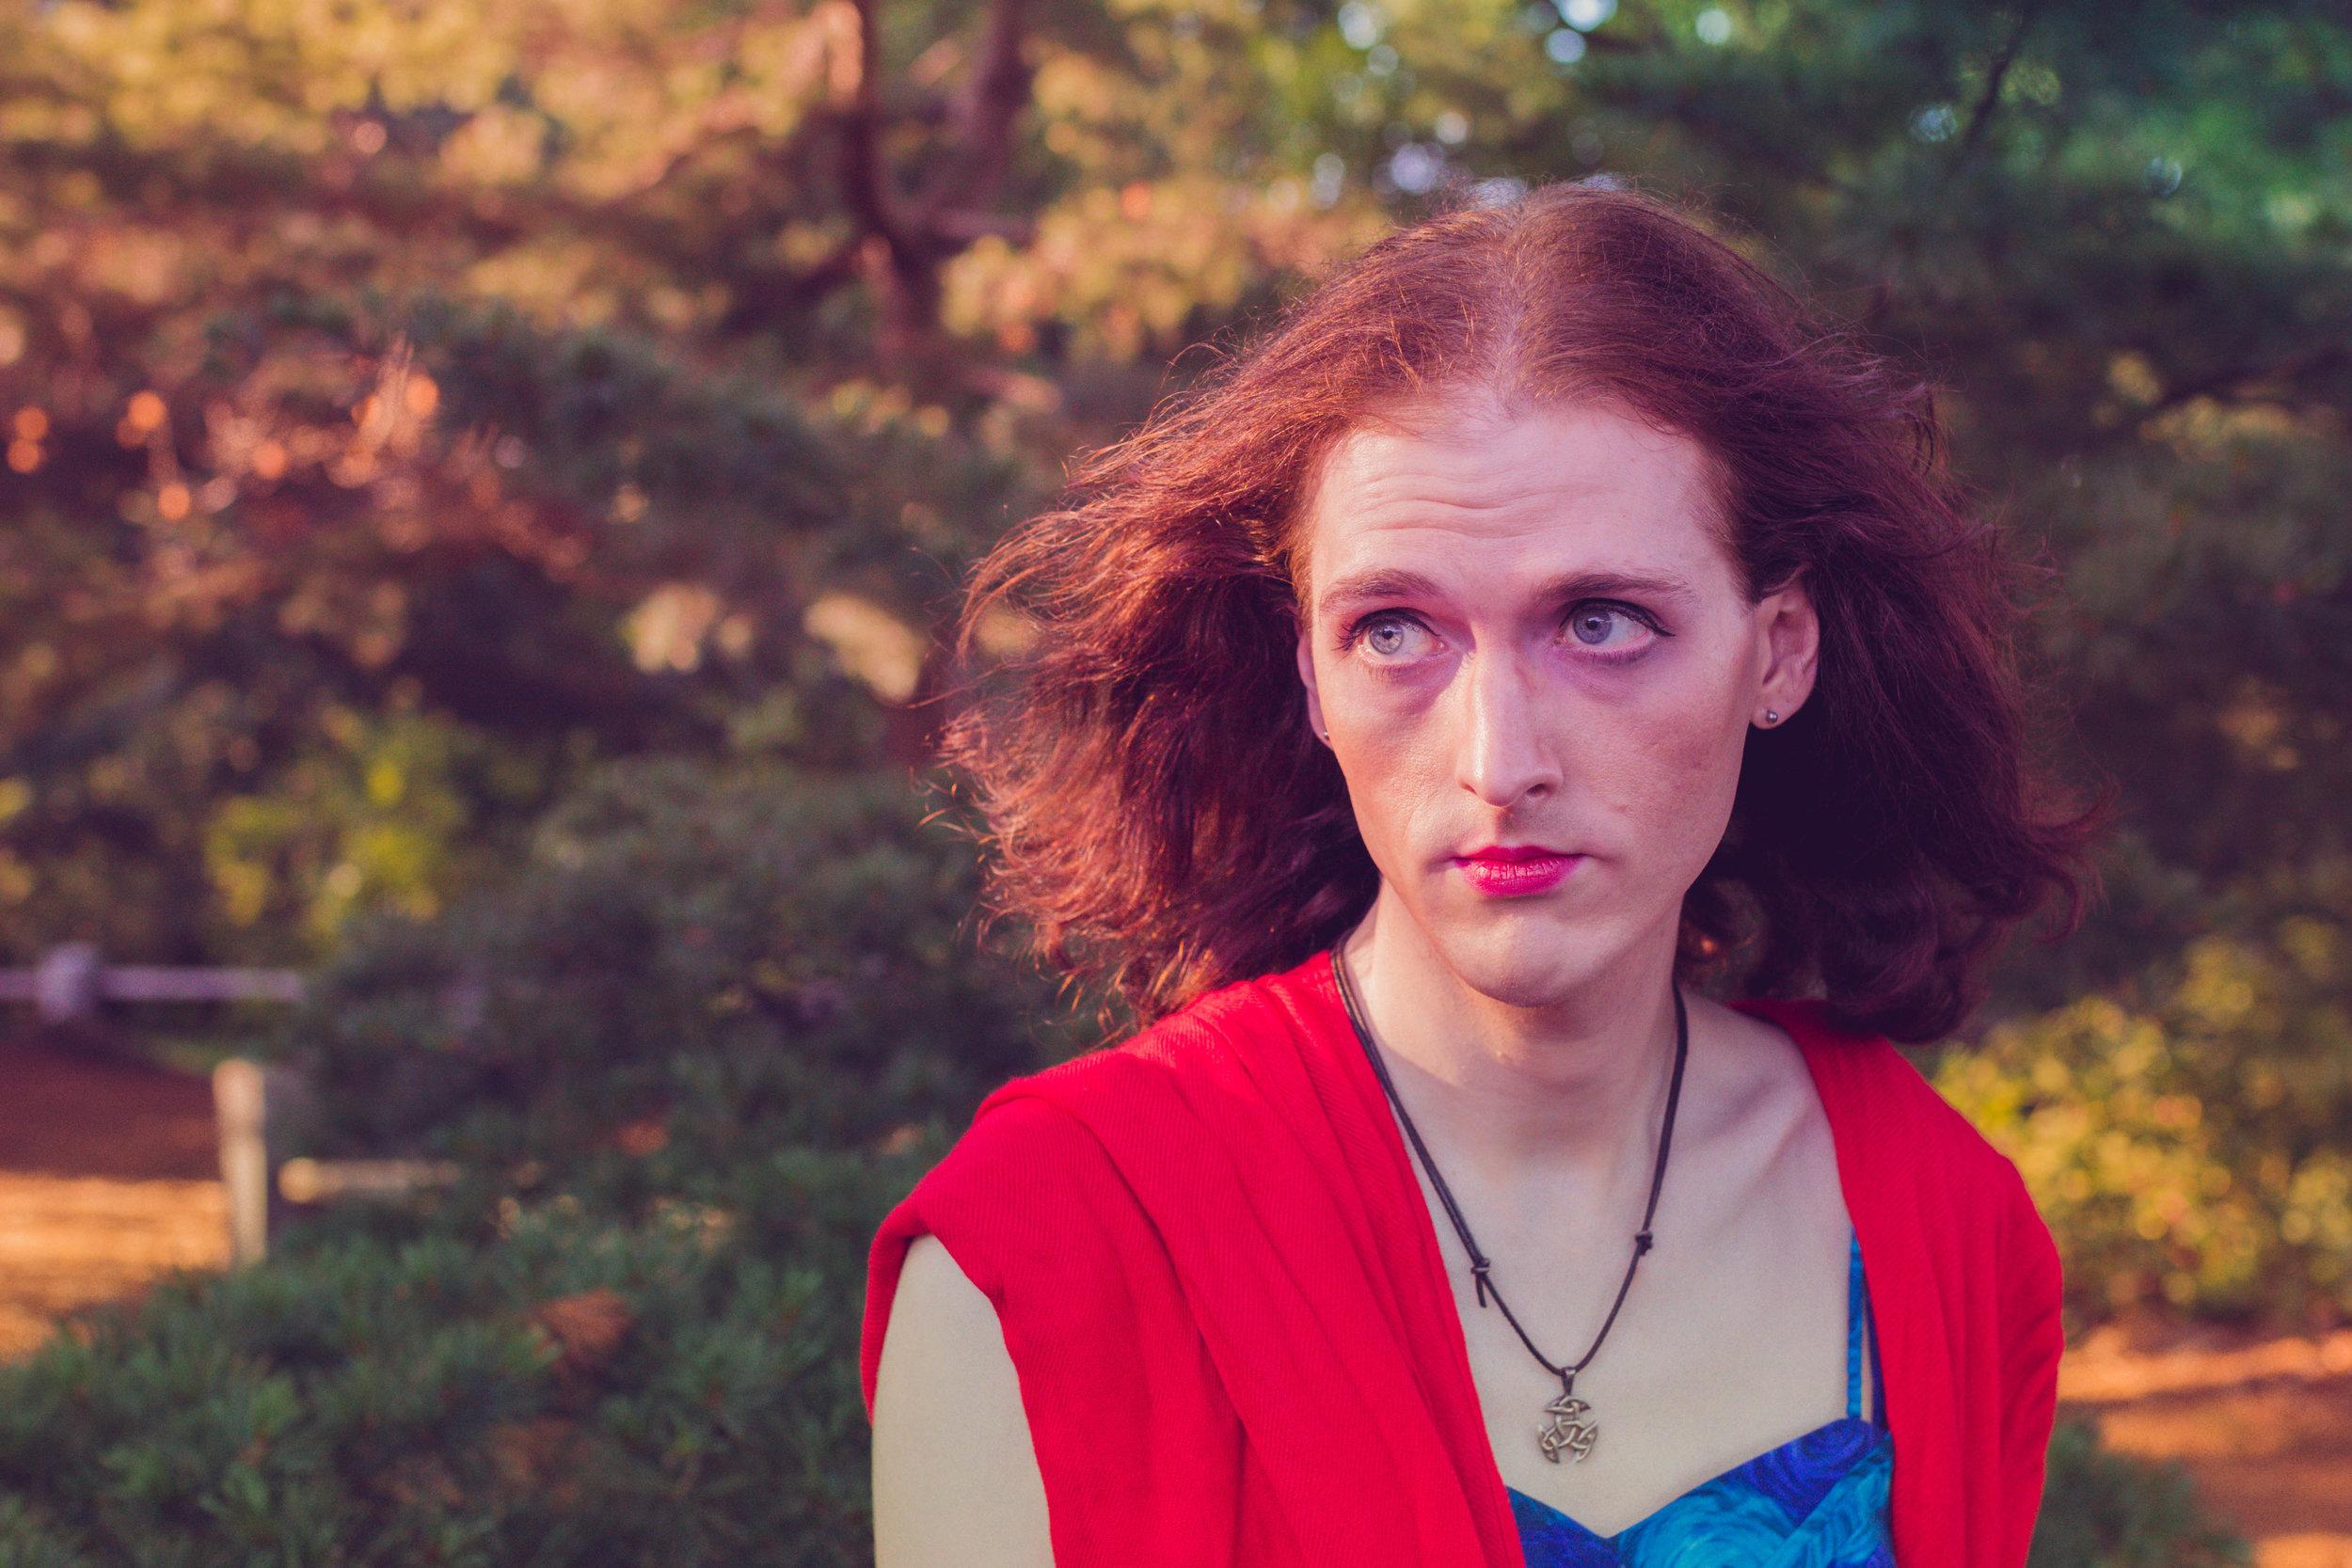 Model: Lucy J Lohrenz